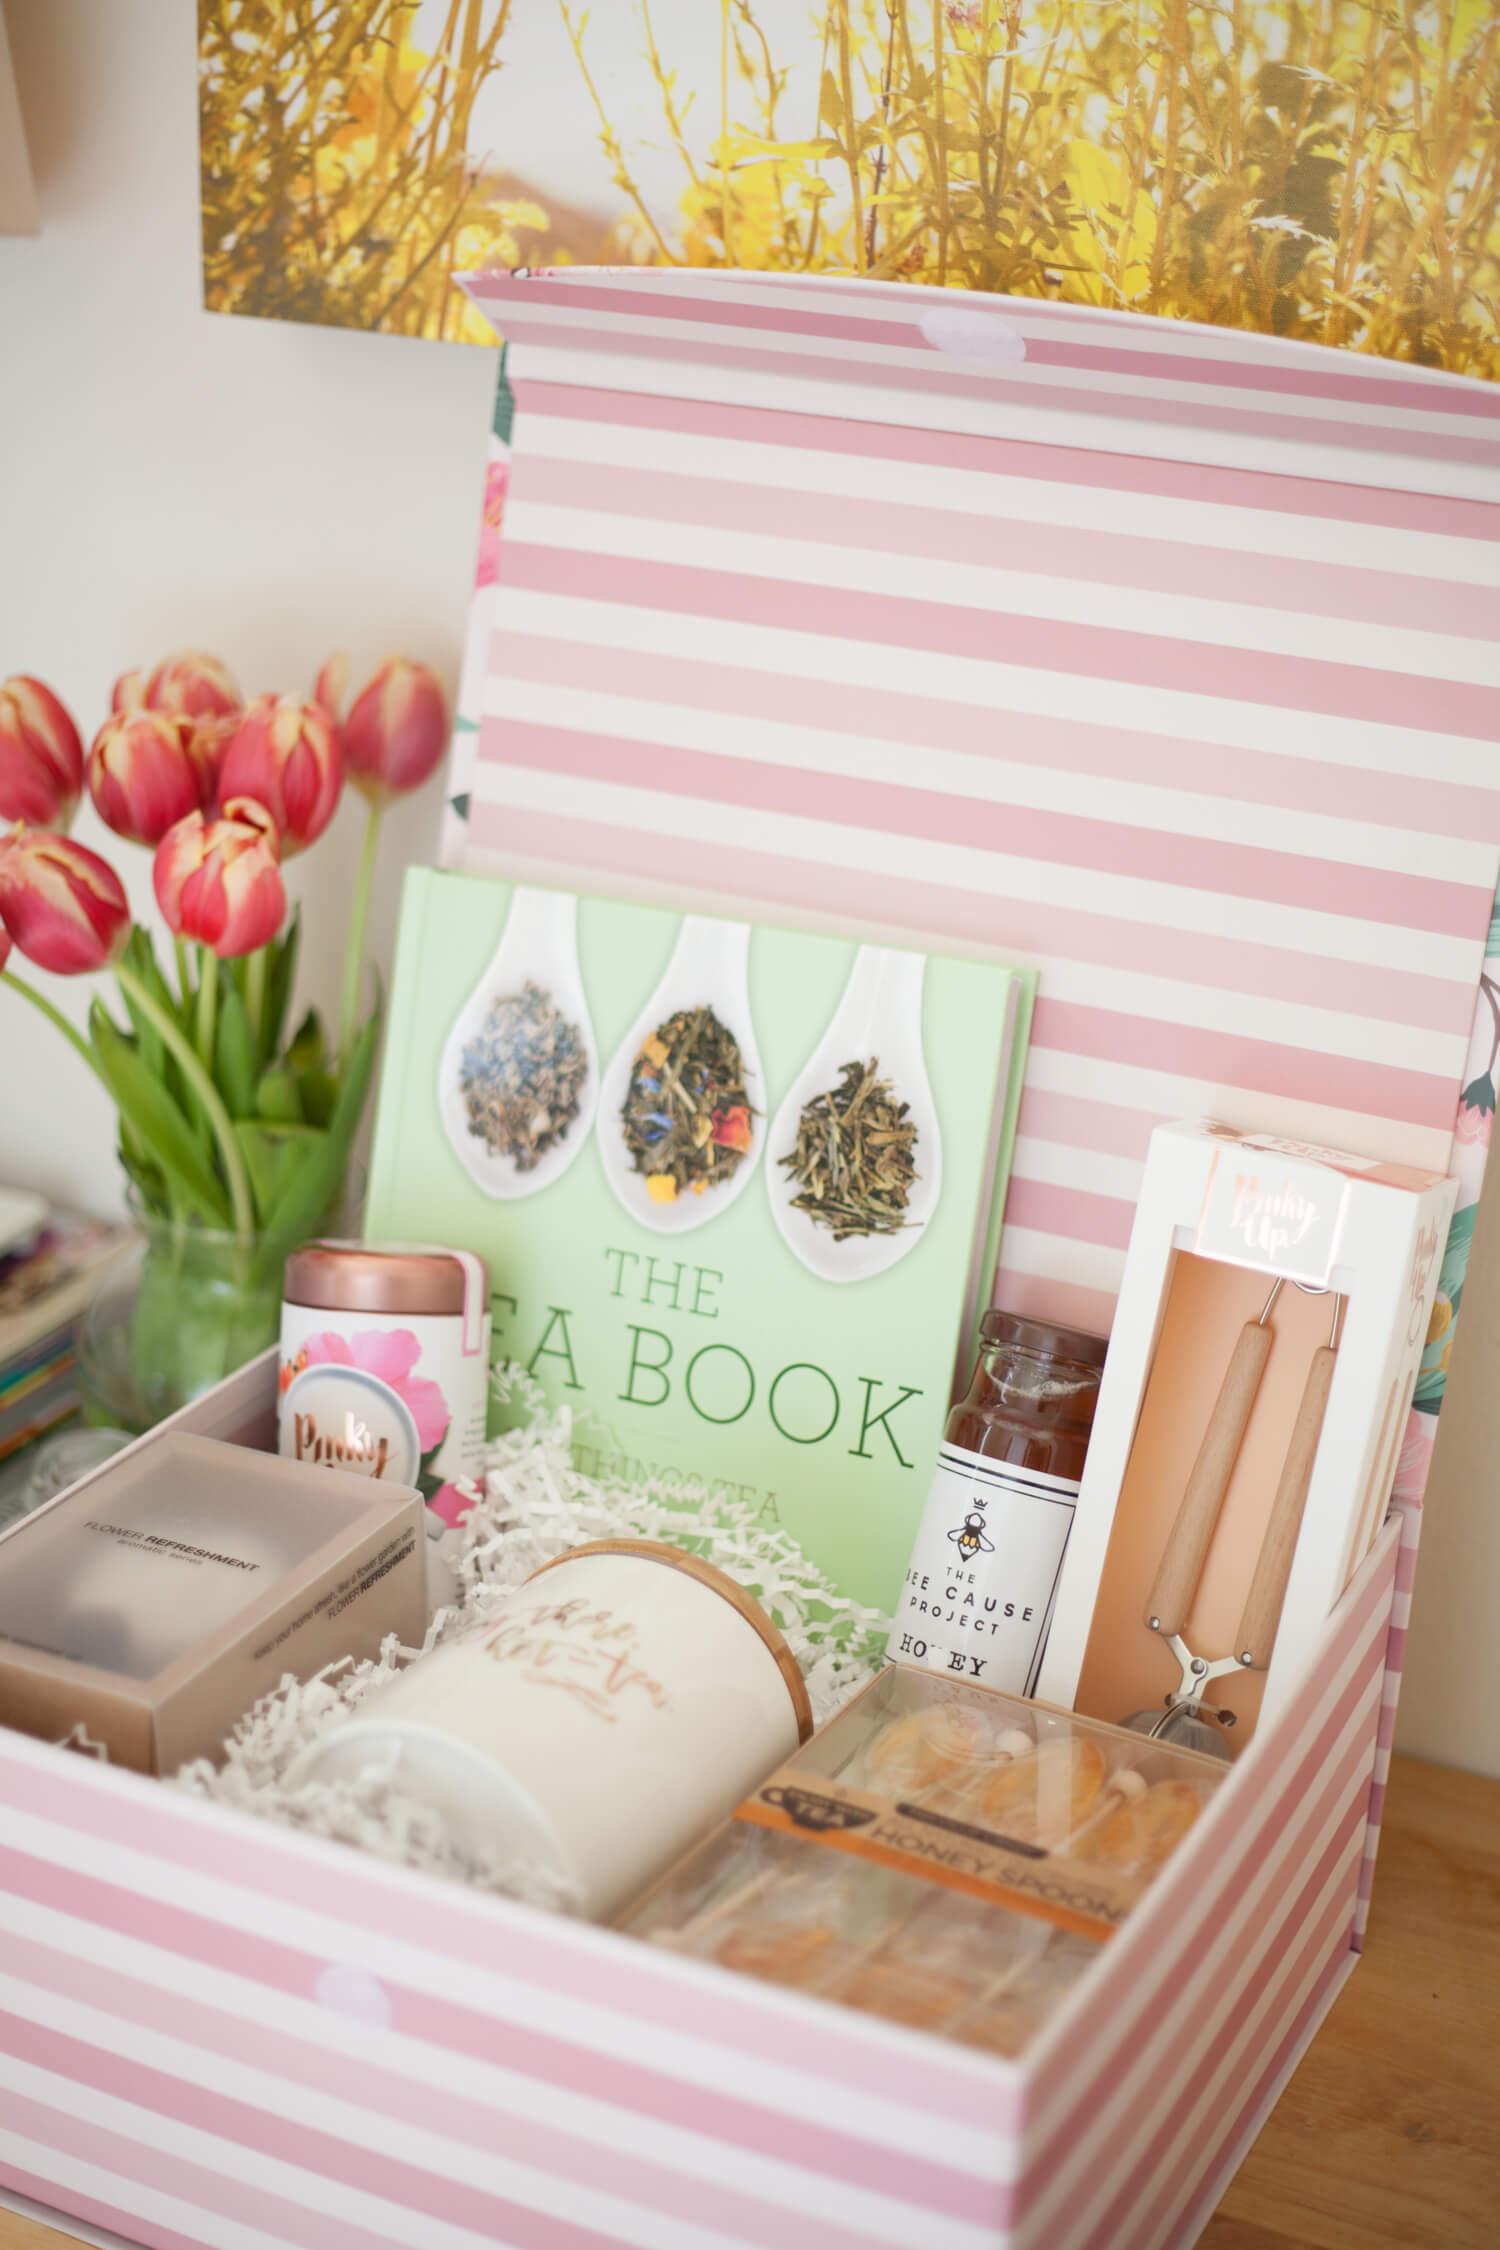 Tea, anyone? Such a cute gift basket idea for the tea lover!